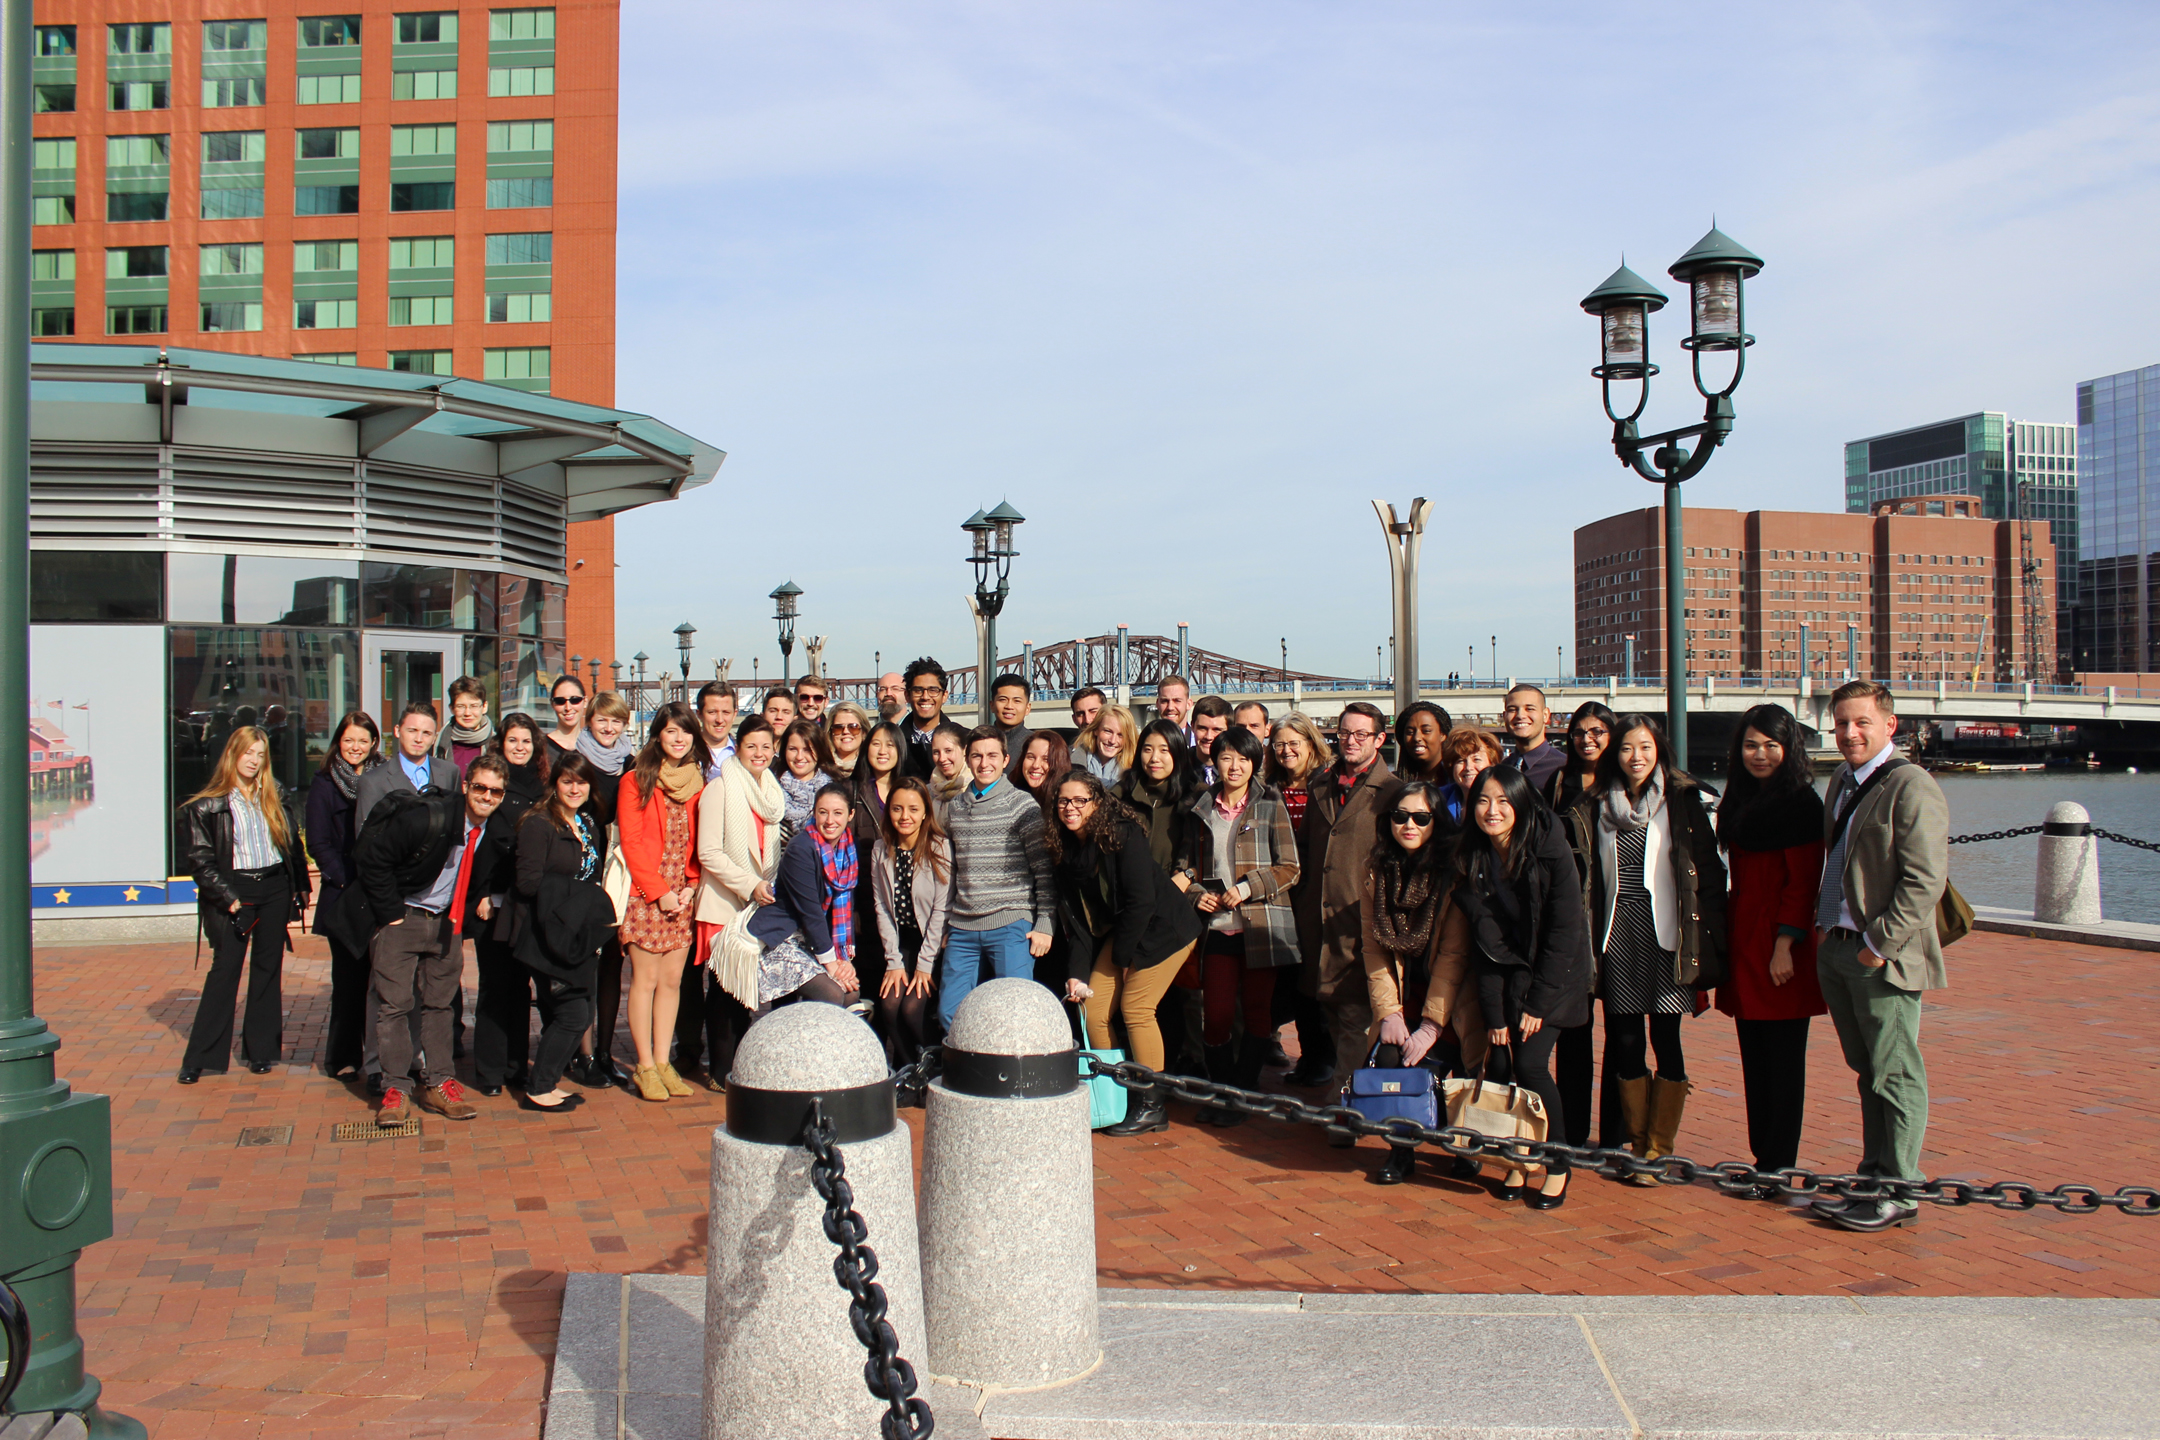 landscape architecture students make professional field trip to boston